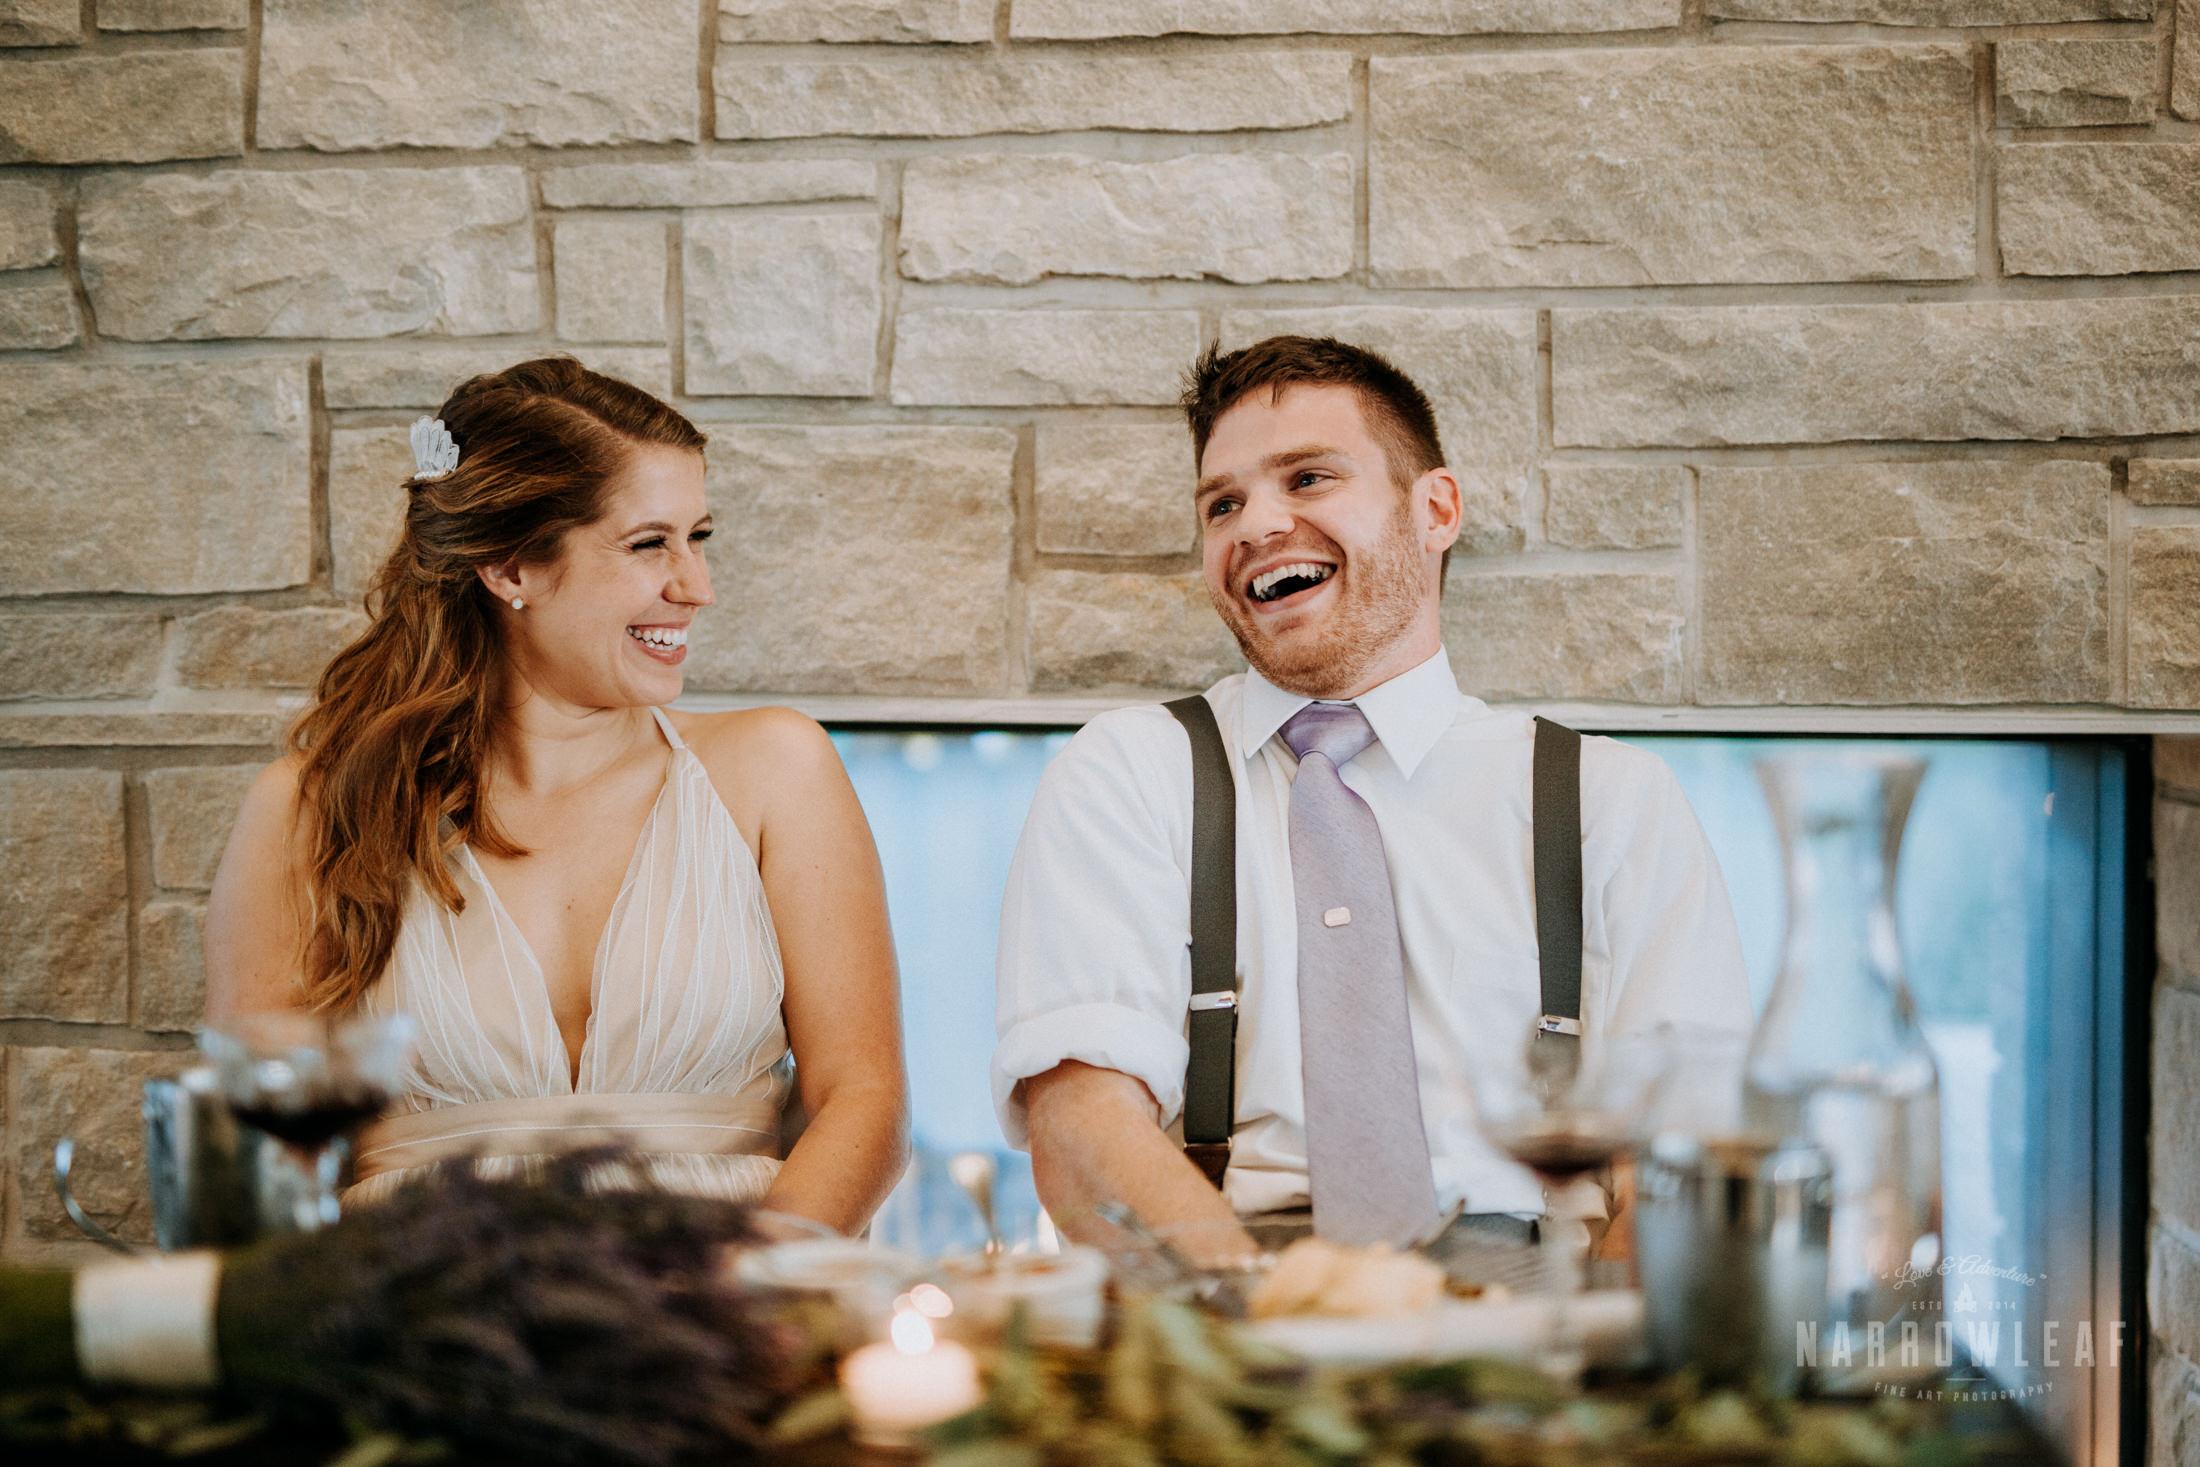 door-county-wedding-photographer-in-the-woods-Narrowleaf_Love_and_Adventure_Photography-9767.jpg